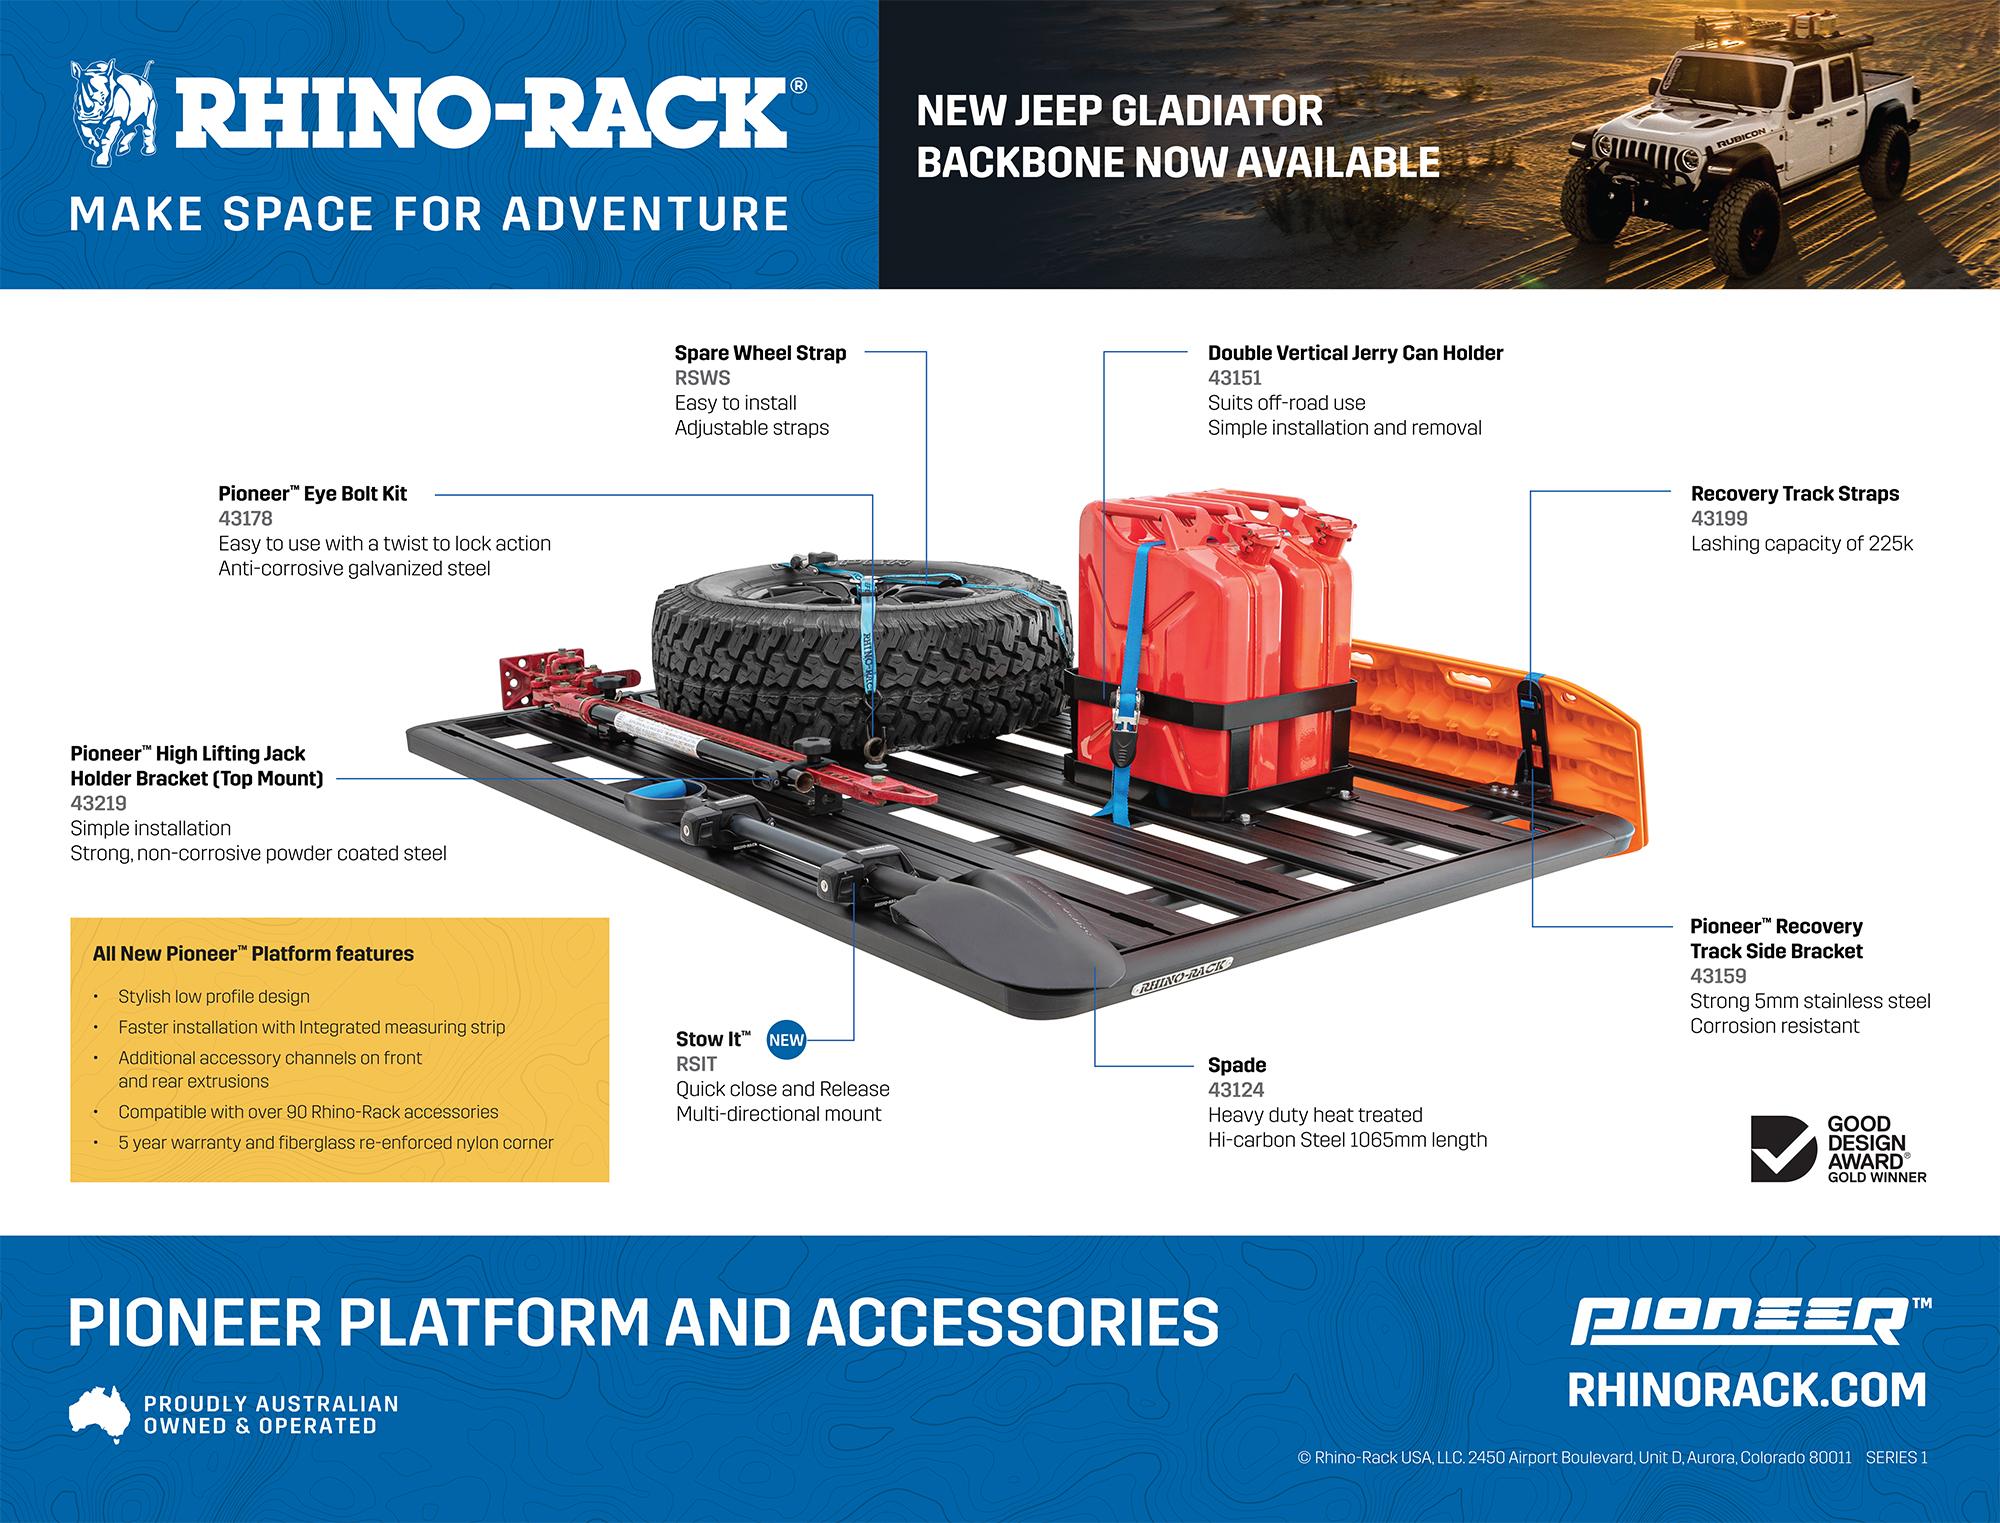 Rhino-Rack Make Space For Adventure